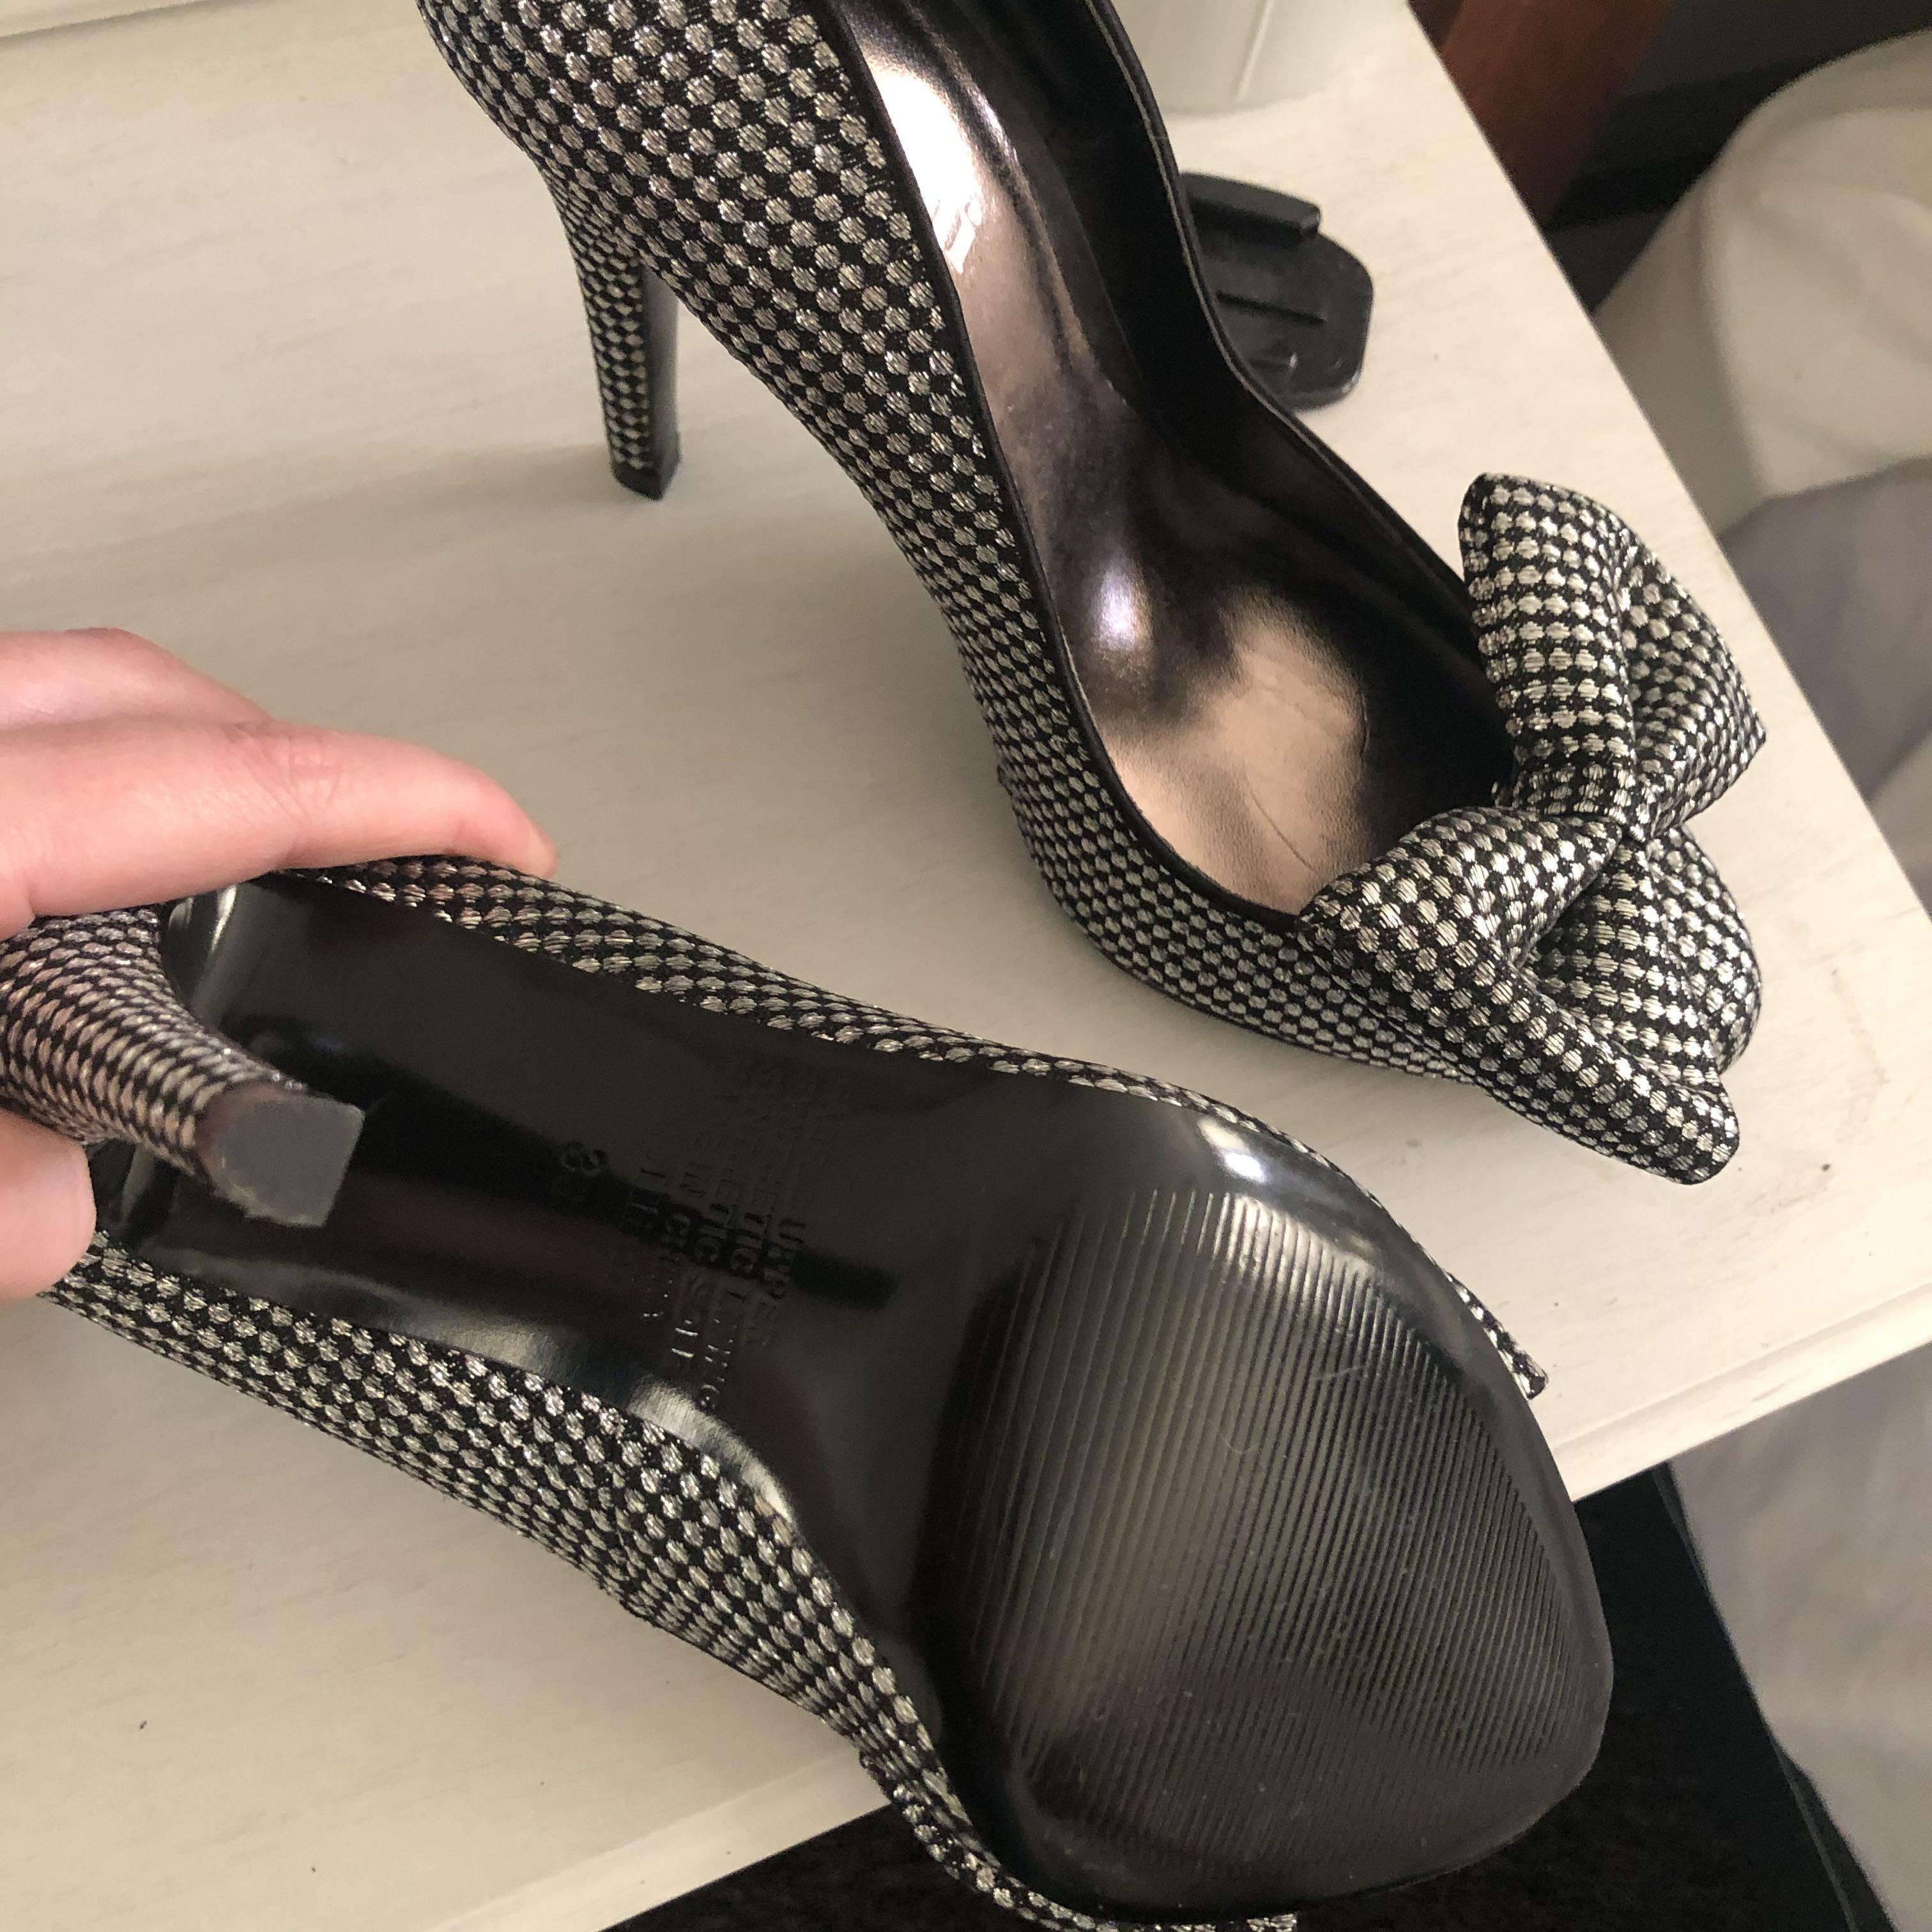 Mollini silver and black pumps / heels with detachable bows Sz 38EU